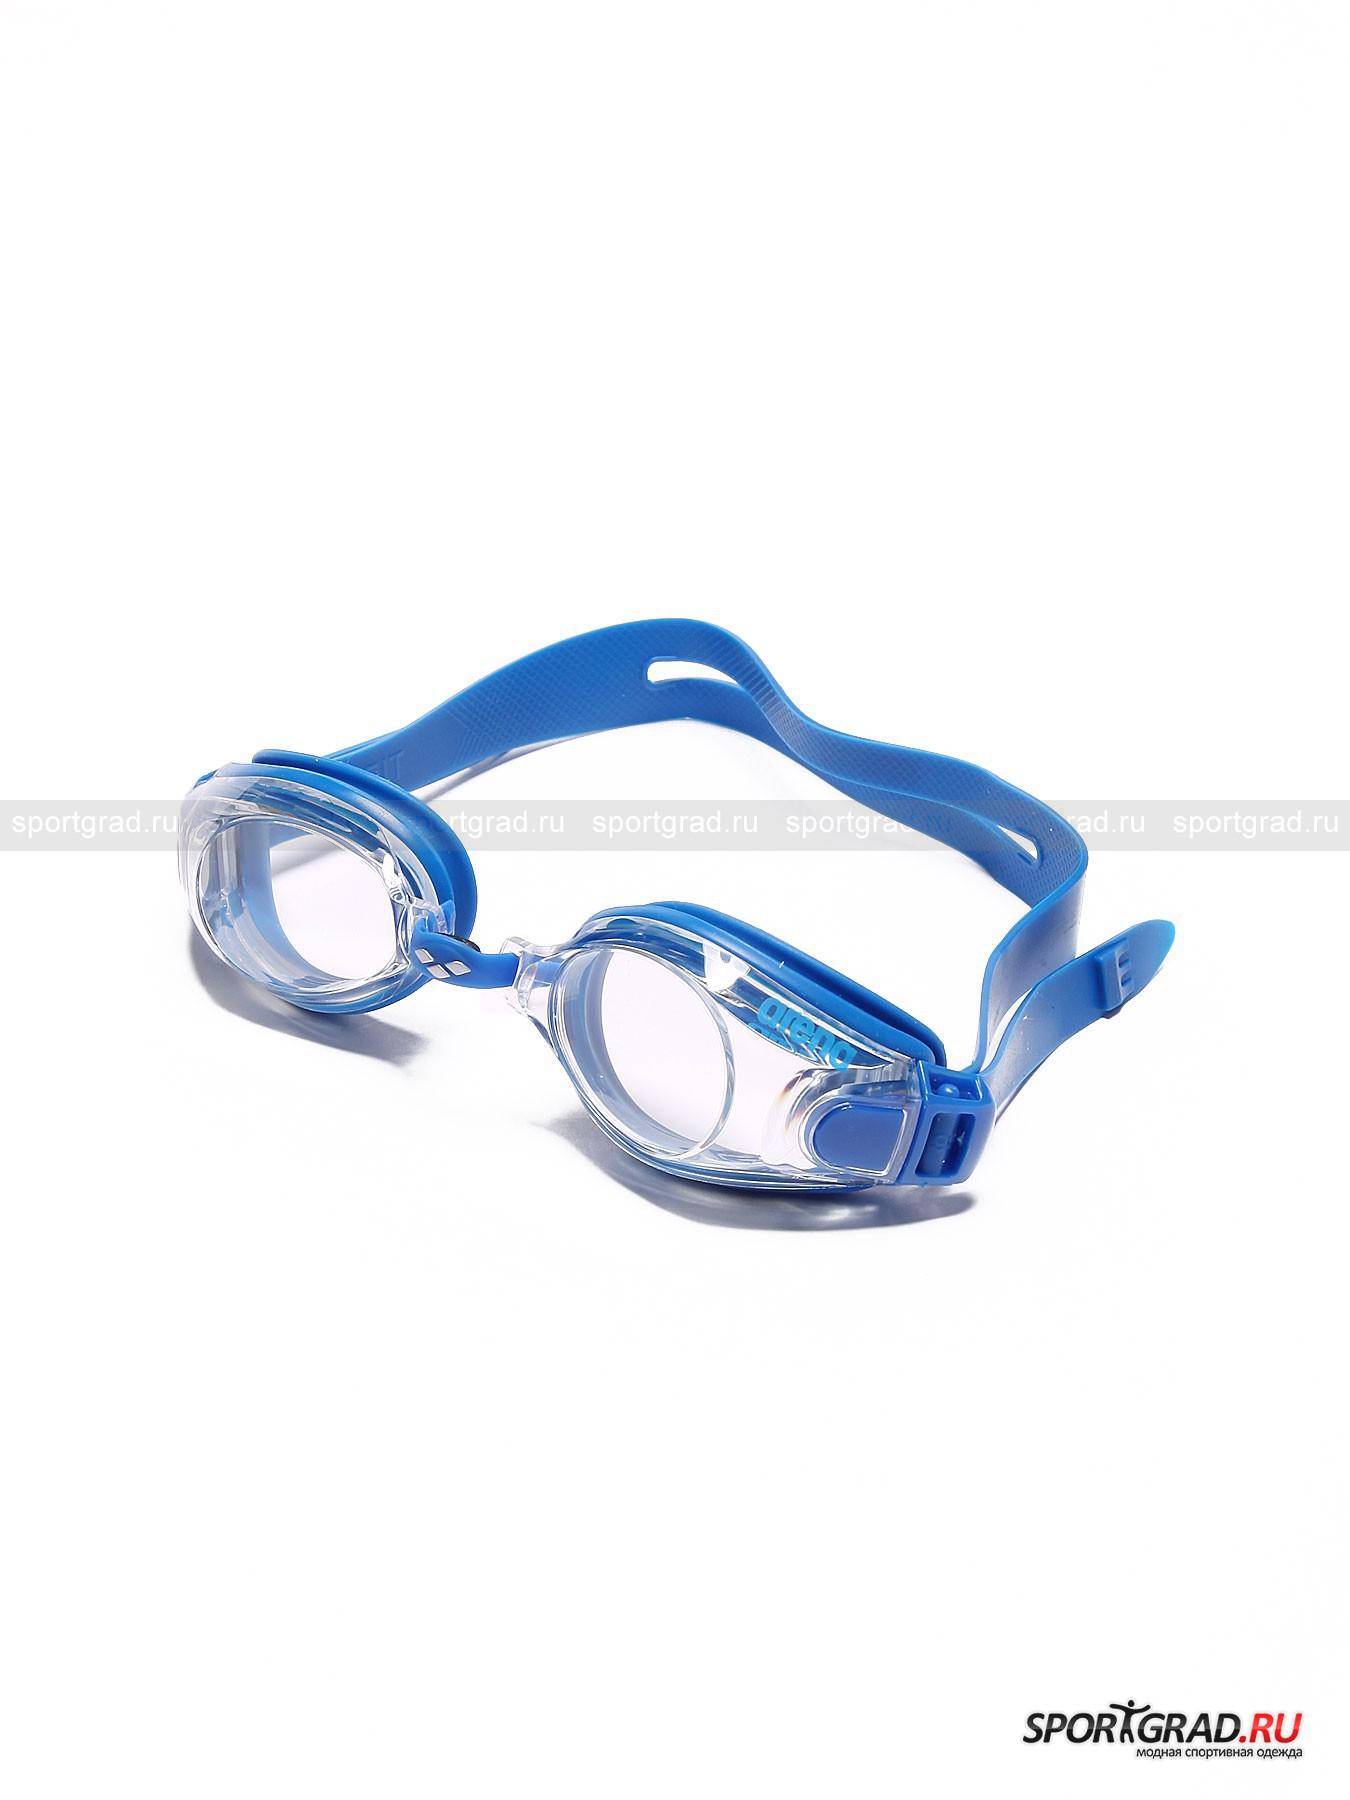 Очки для плавания Zoom X-Fit ARENA